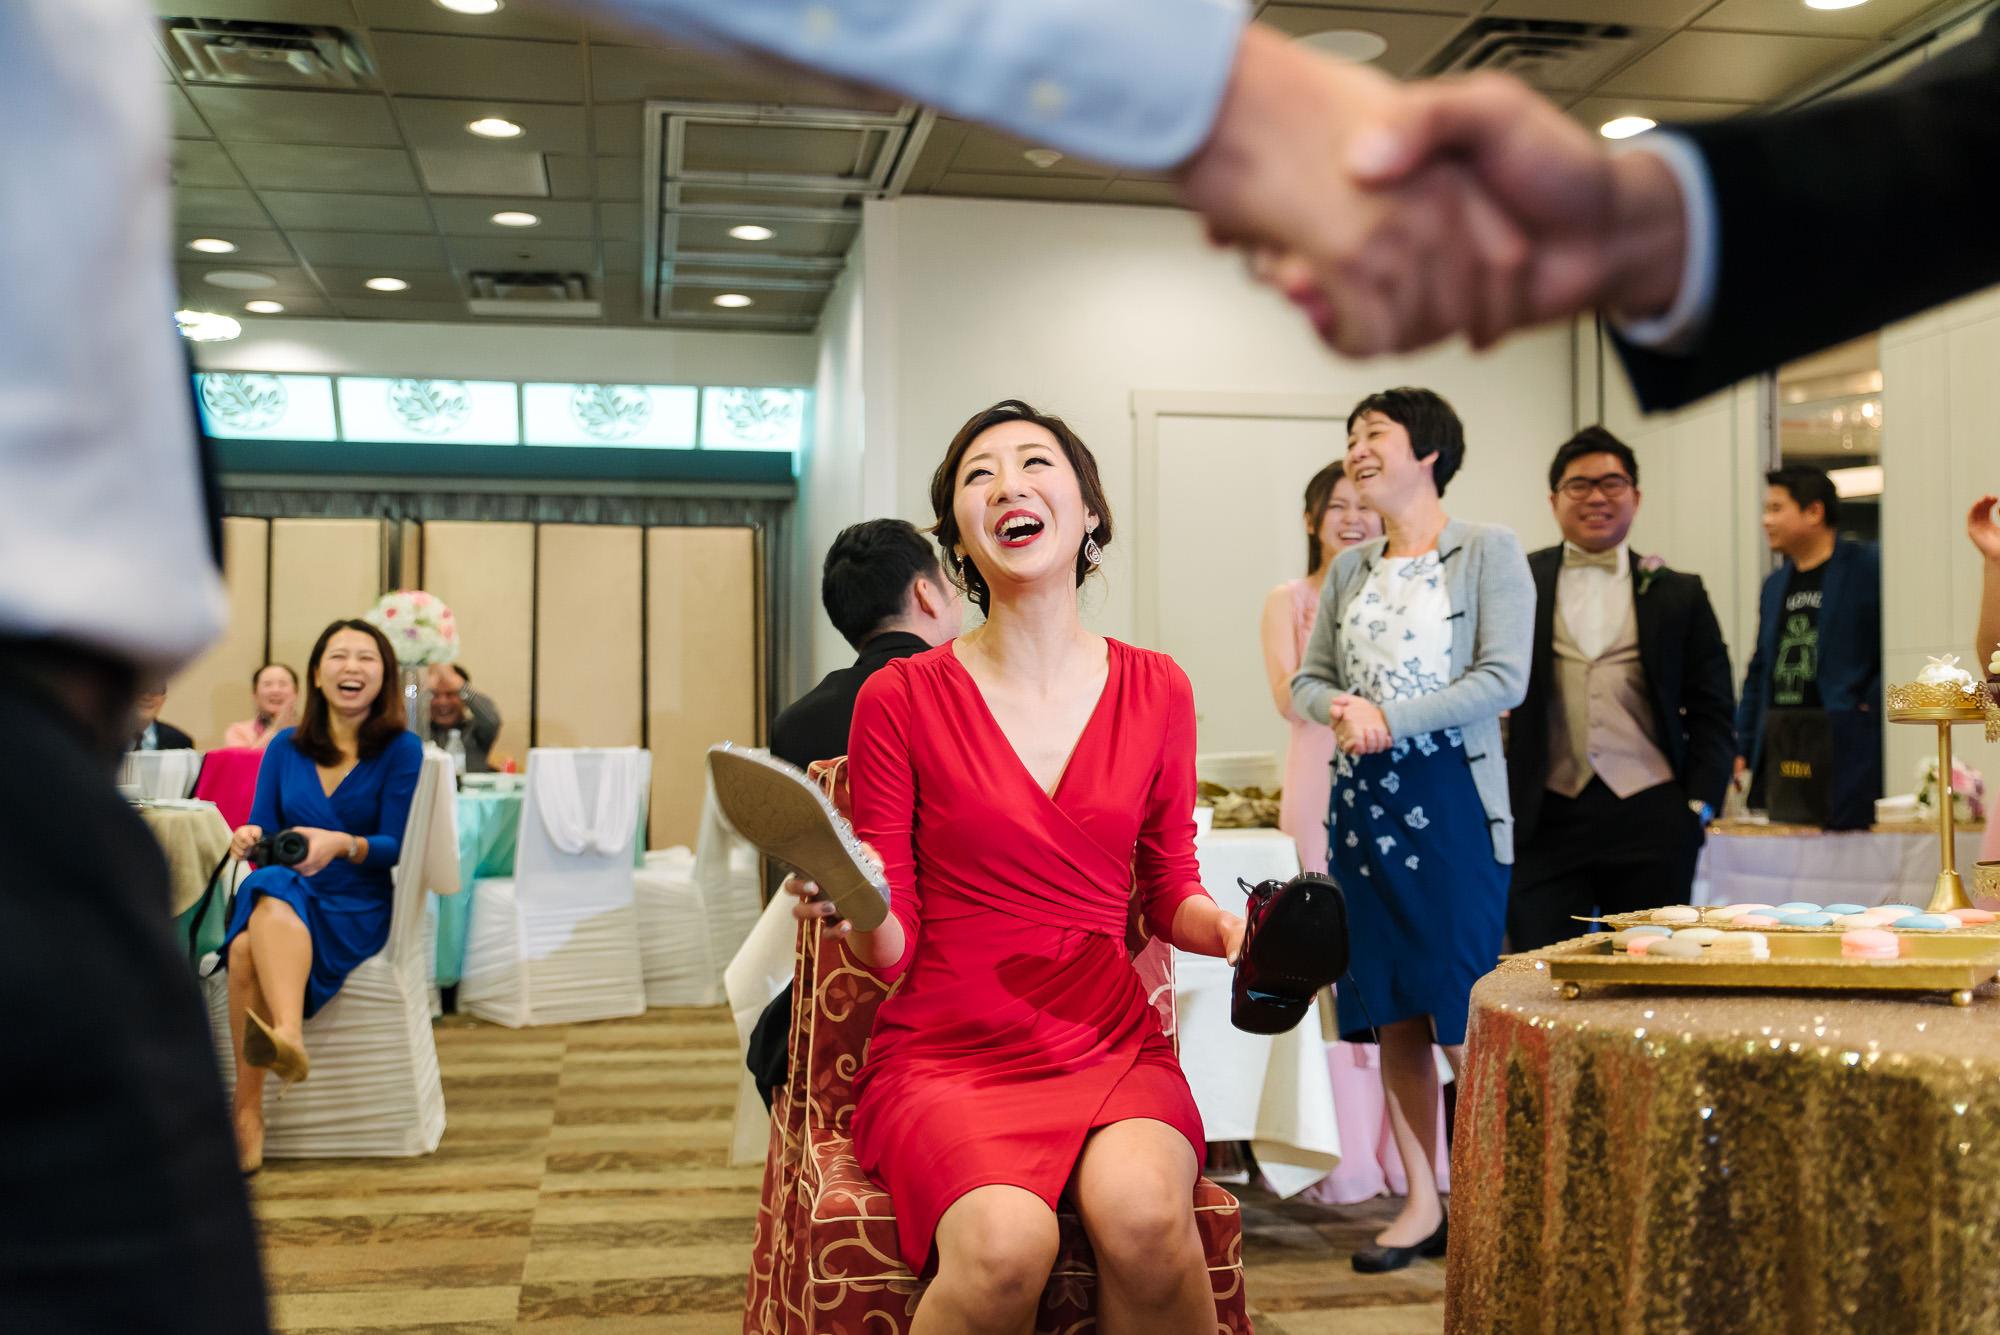 richmond_wedding_reception 21063714.jpg